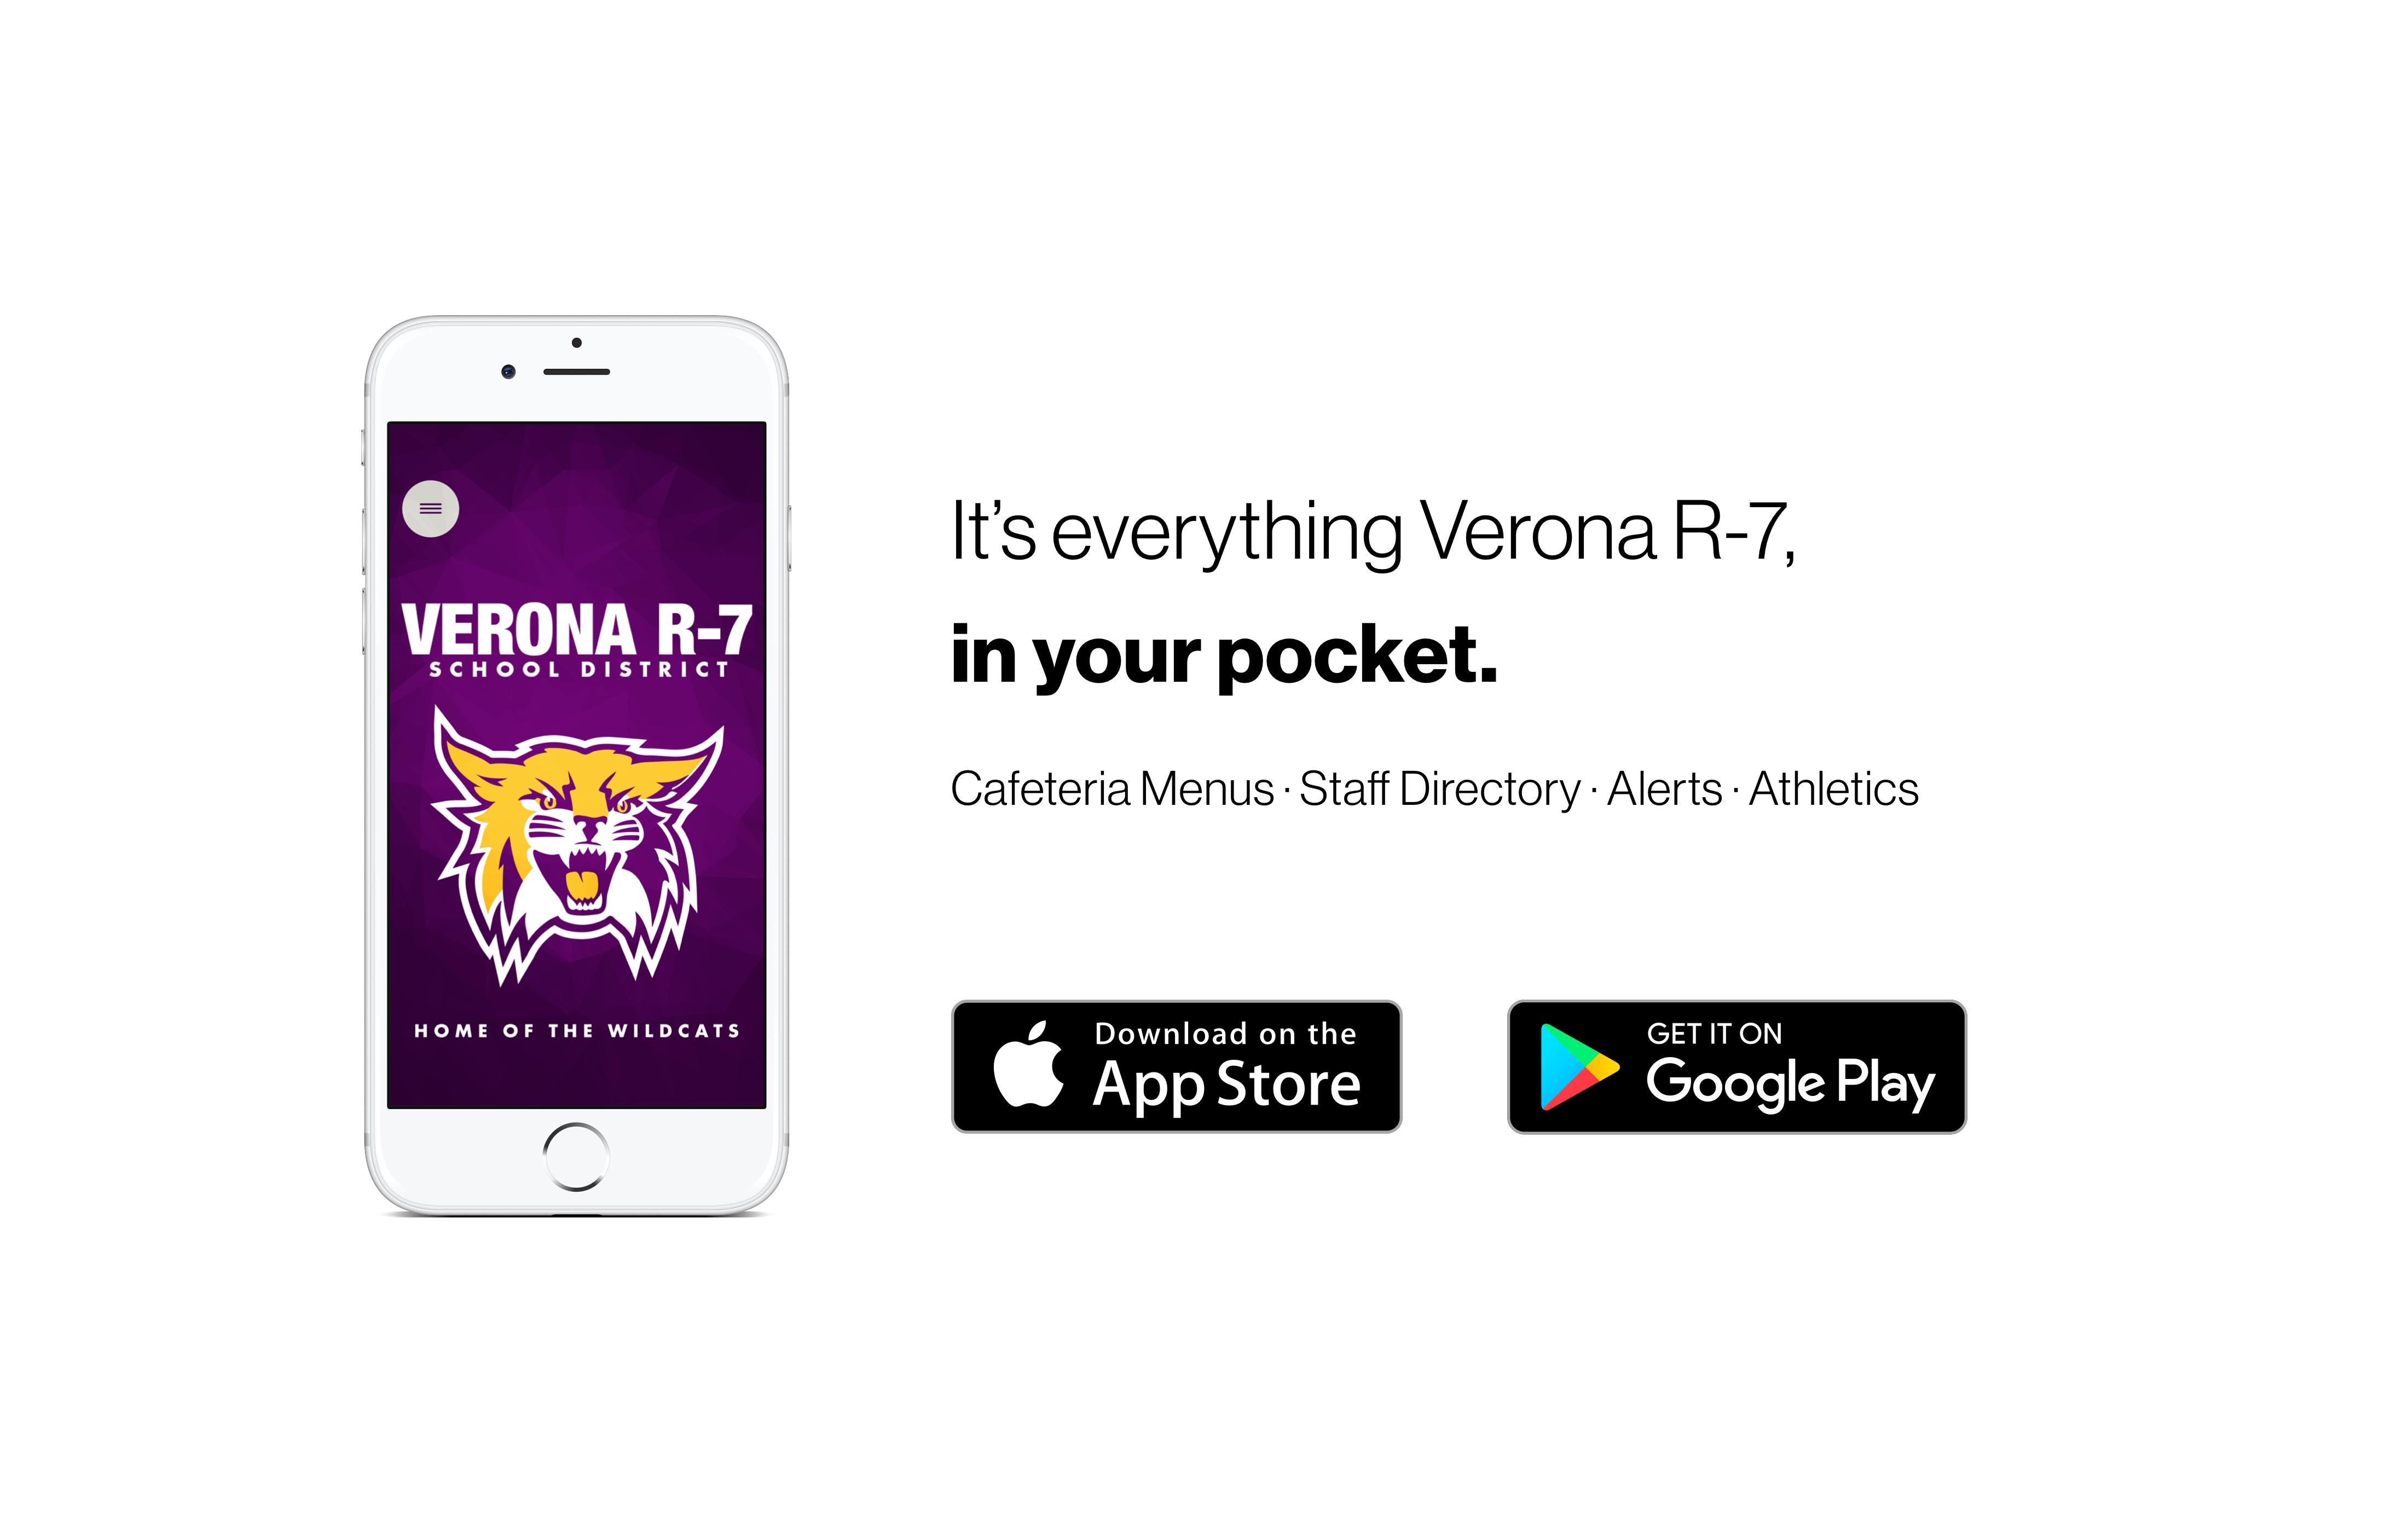 verona mobile app promo